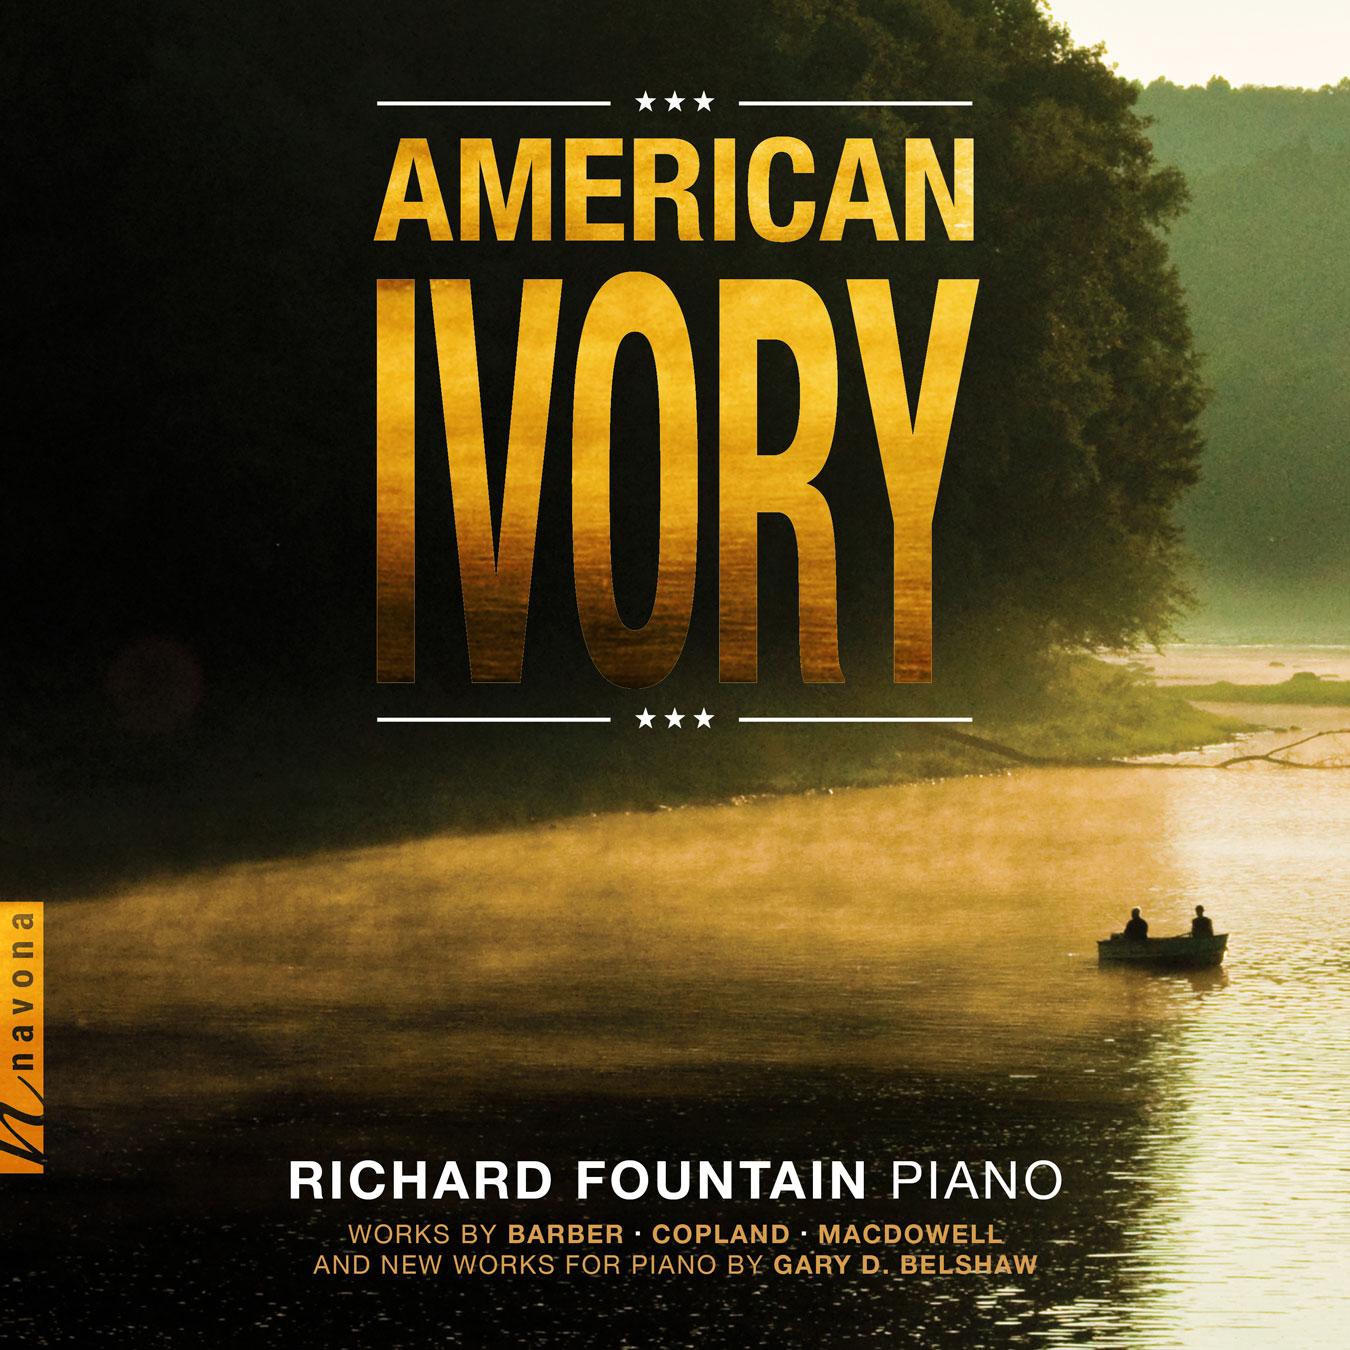 AMERICAN IVORY - album cover